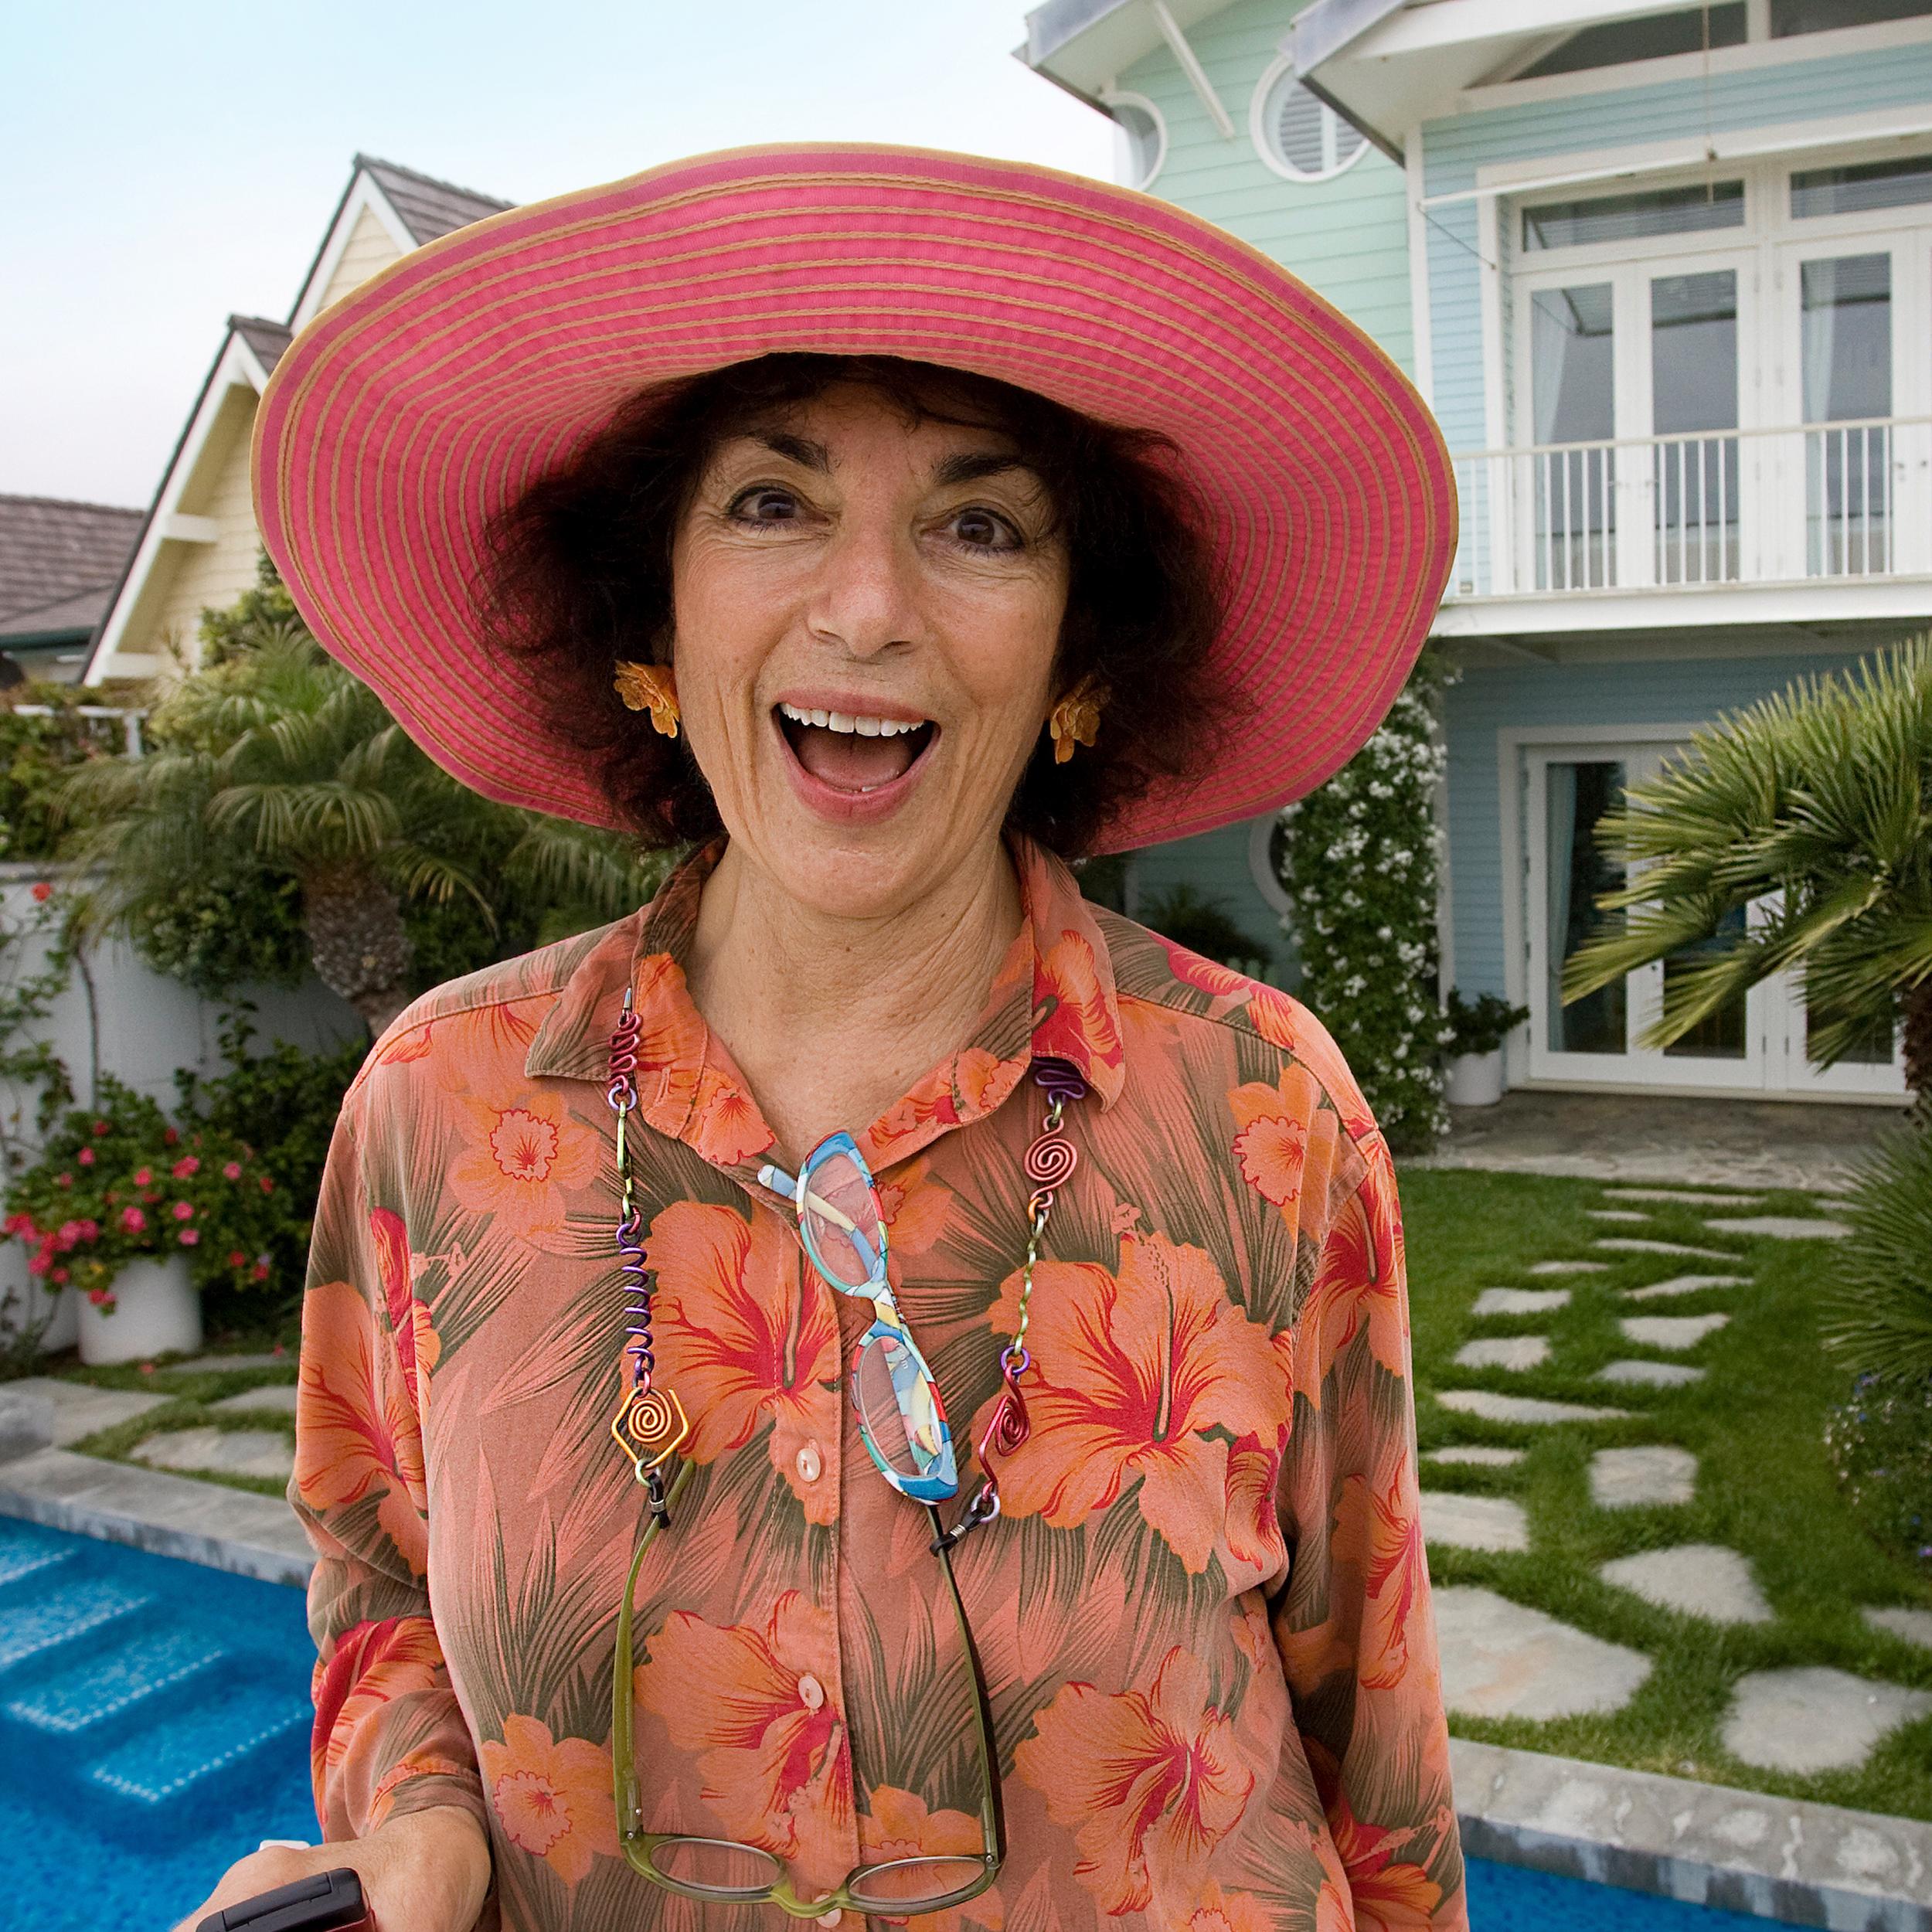 Laura in Malibu by Kimball Hall